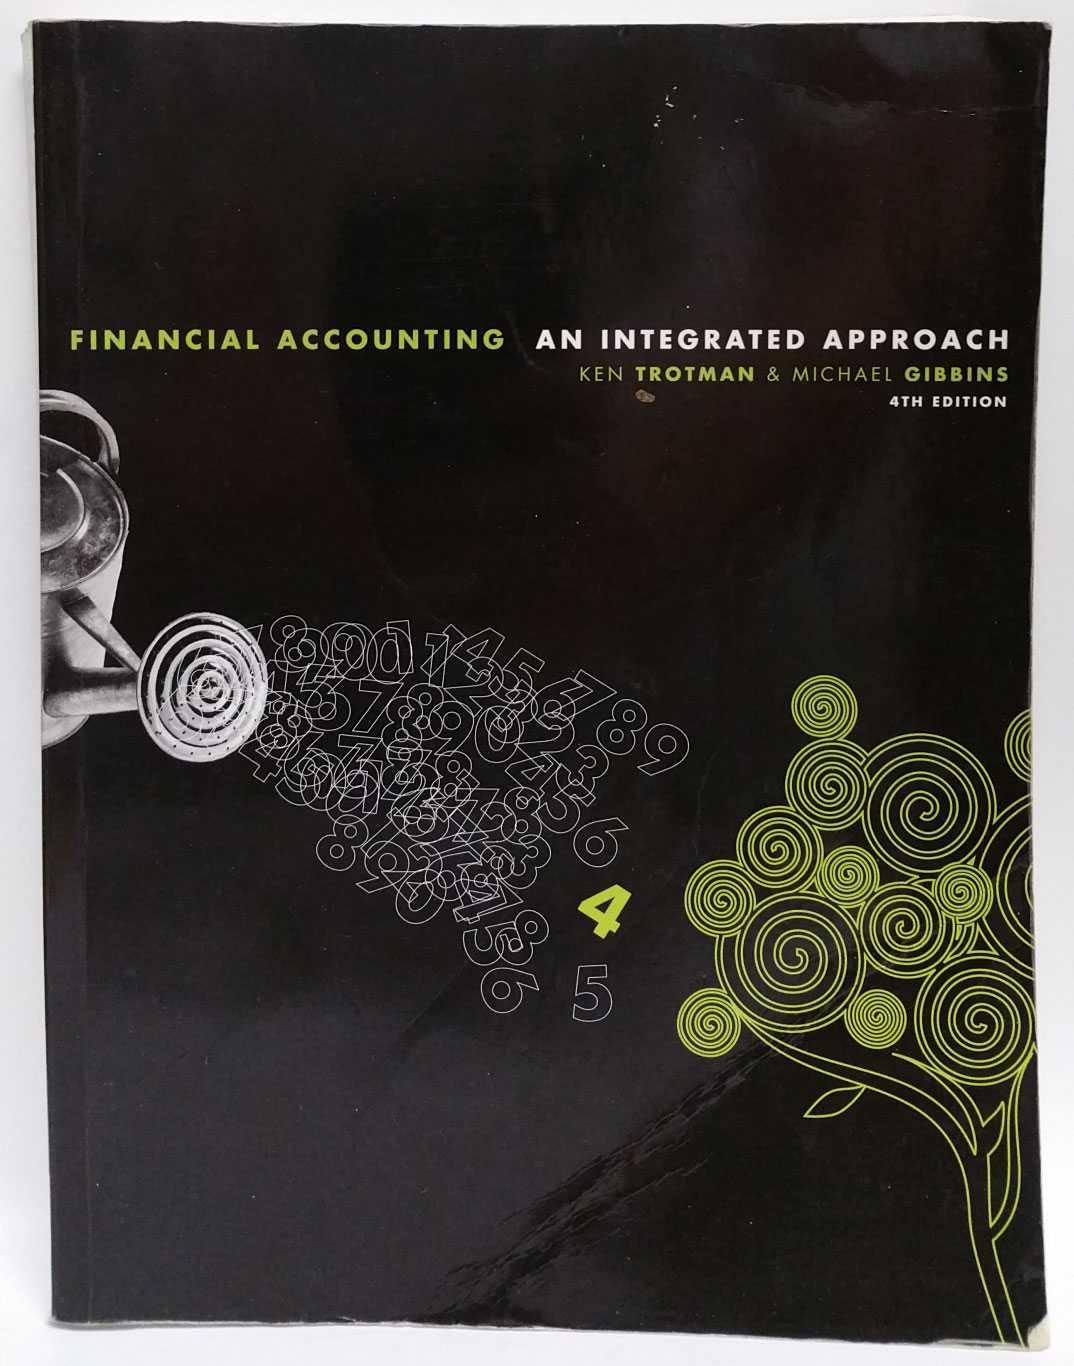 Financial Accounting: An Integrated Approach, Ken Trotman; Michael Gibbins